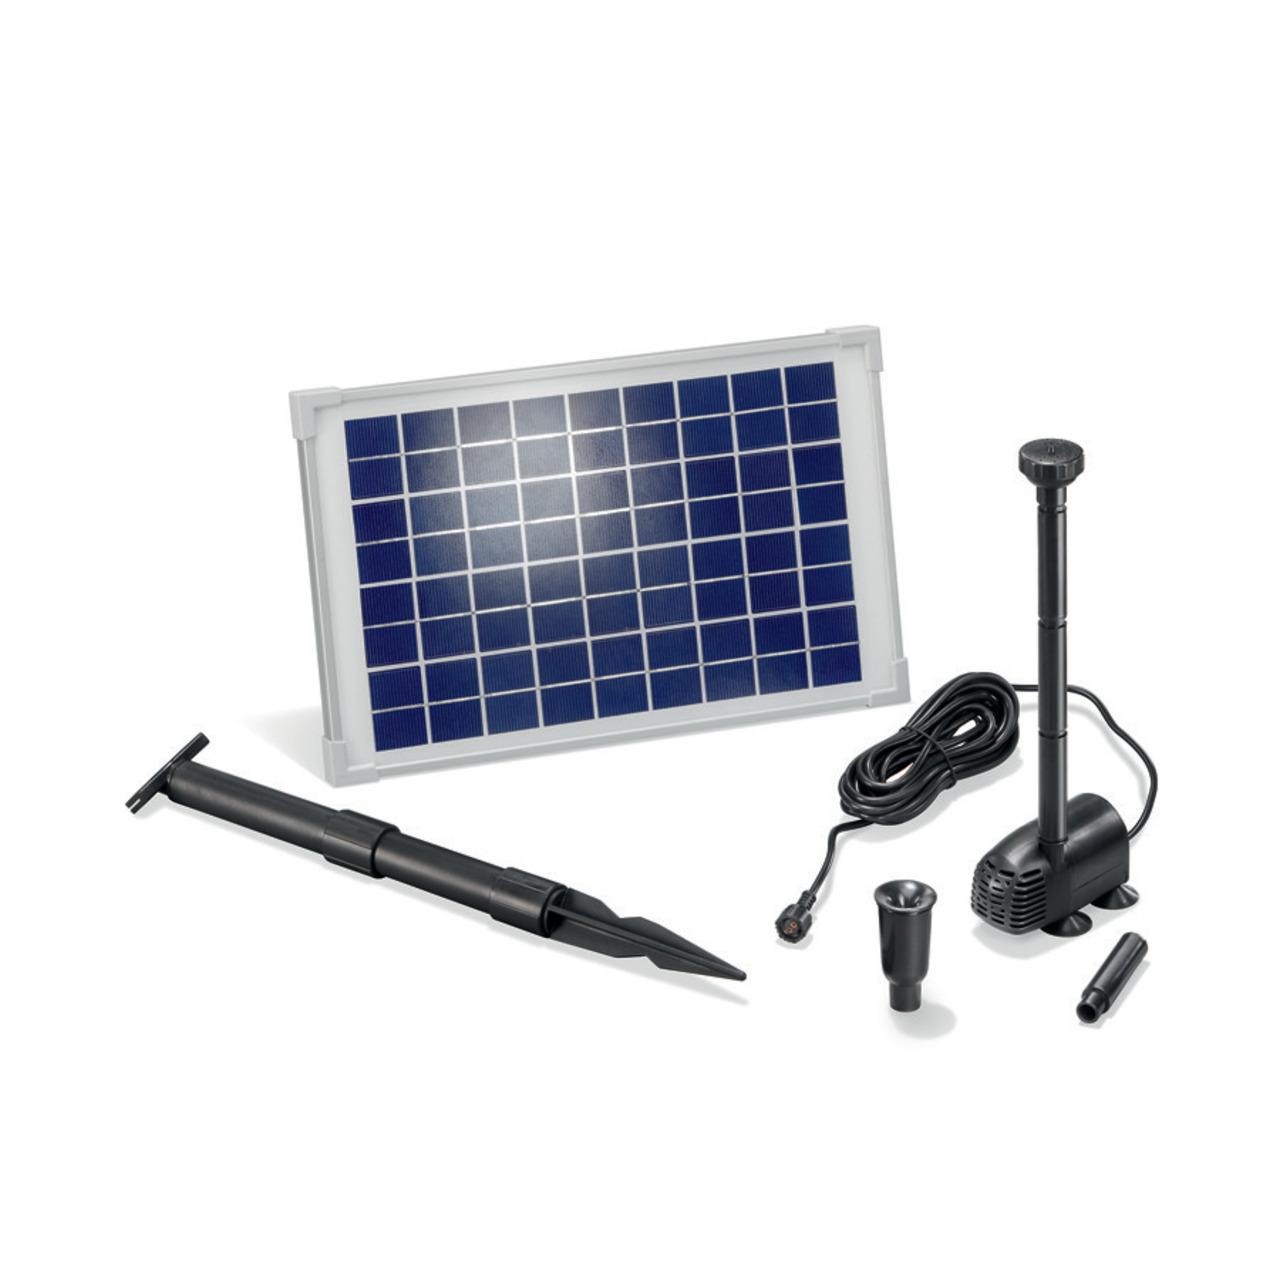 esotec Water Splash 10-610 Solar-Teichpumpensystem